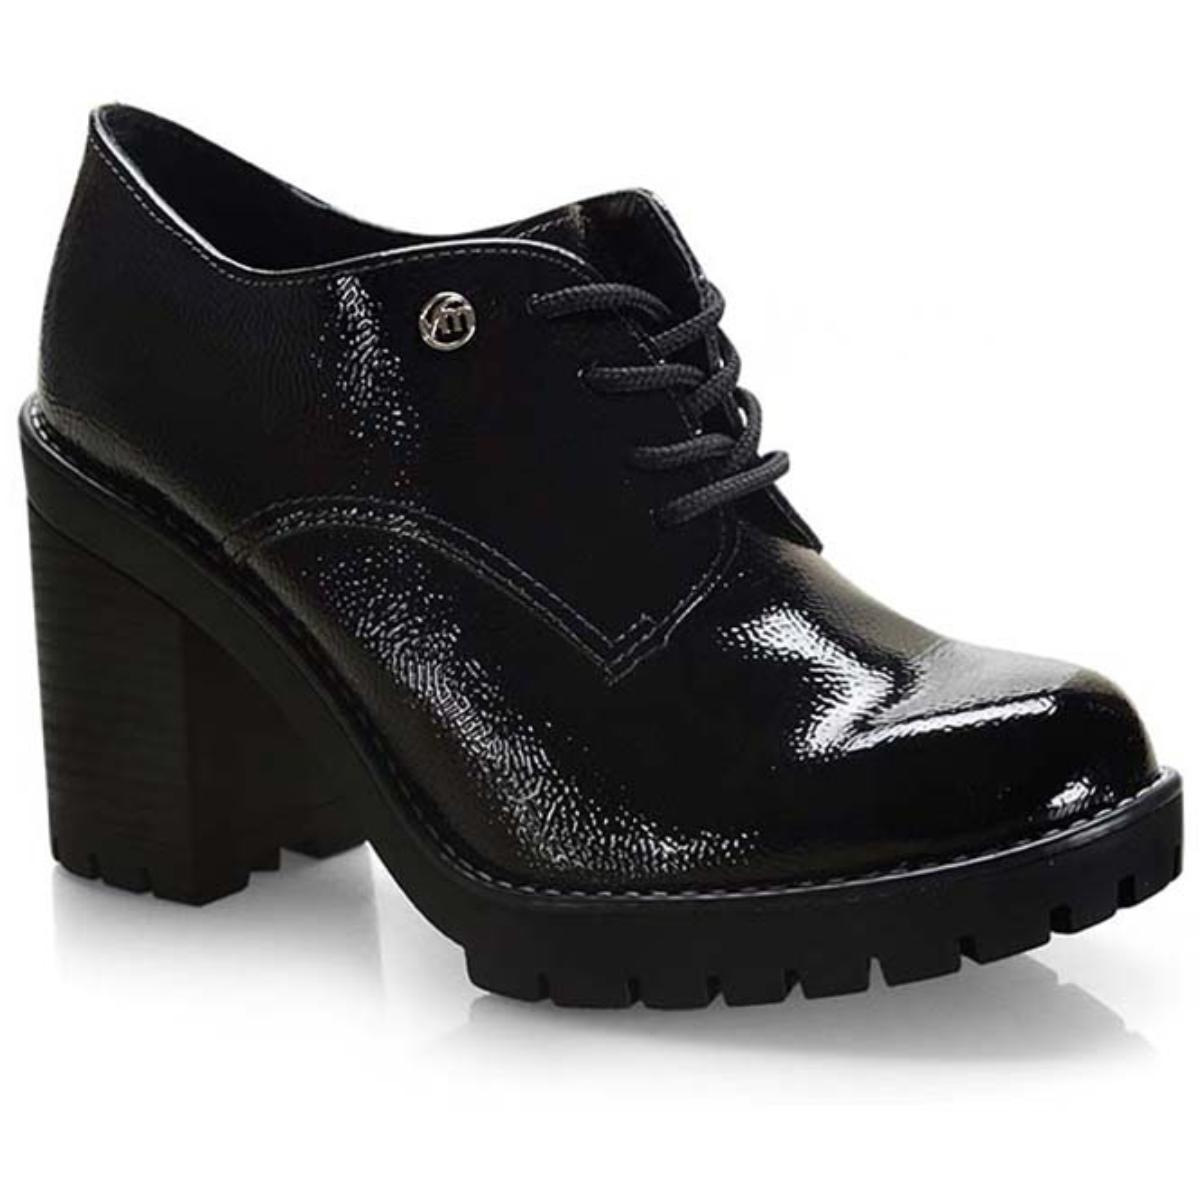 Sapato Feminino Via Marte 19-5902 Preto